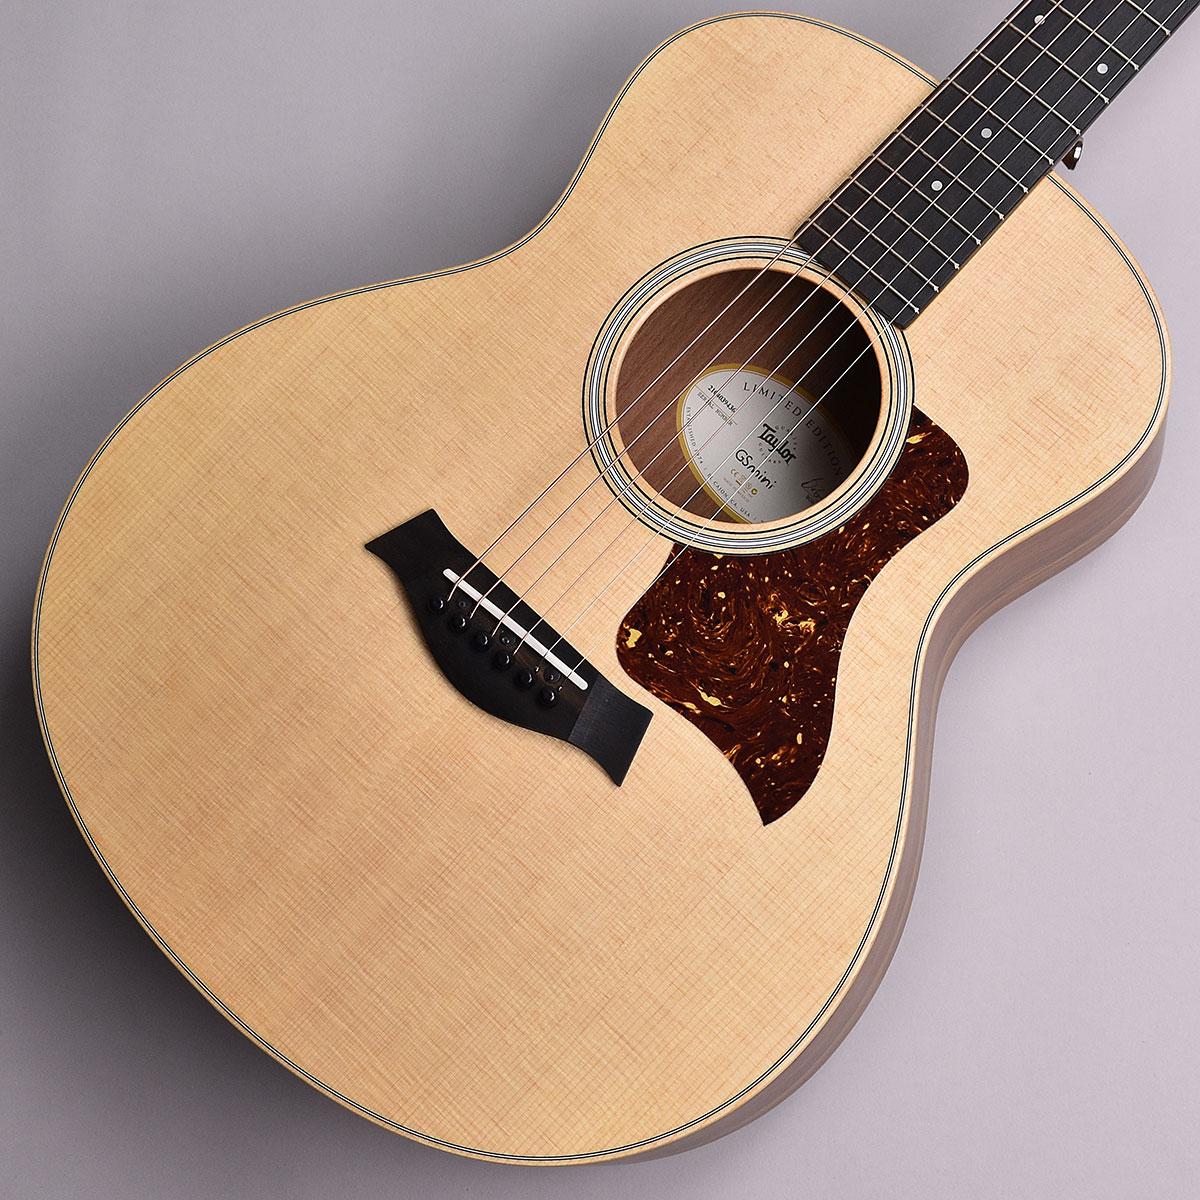 Taylor GS Mini-e Ovangkol Limited S/N:2104039436 ミニアコースティックギター【エレアコ】 【テイラー】【未展示品】